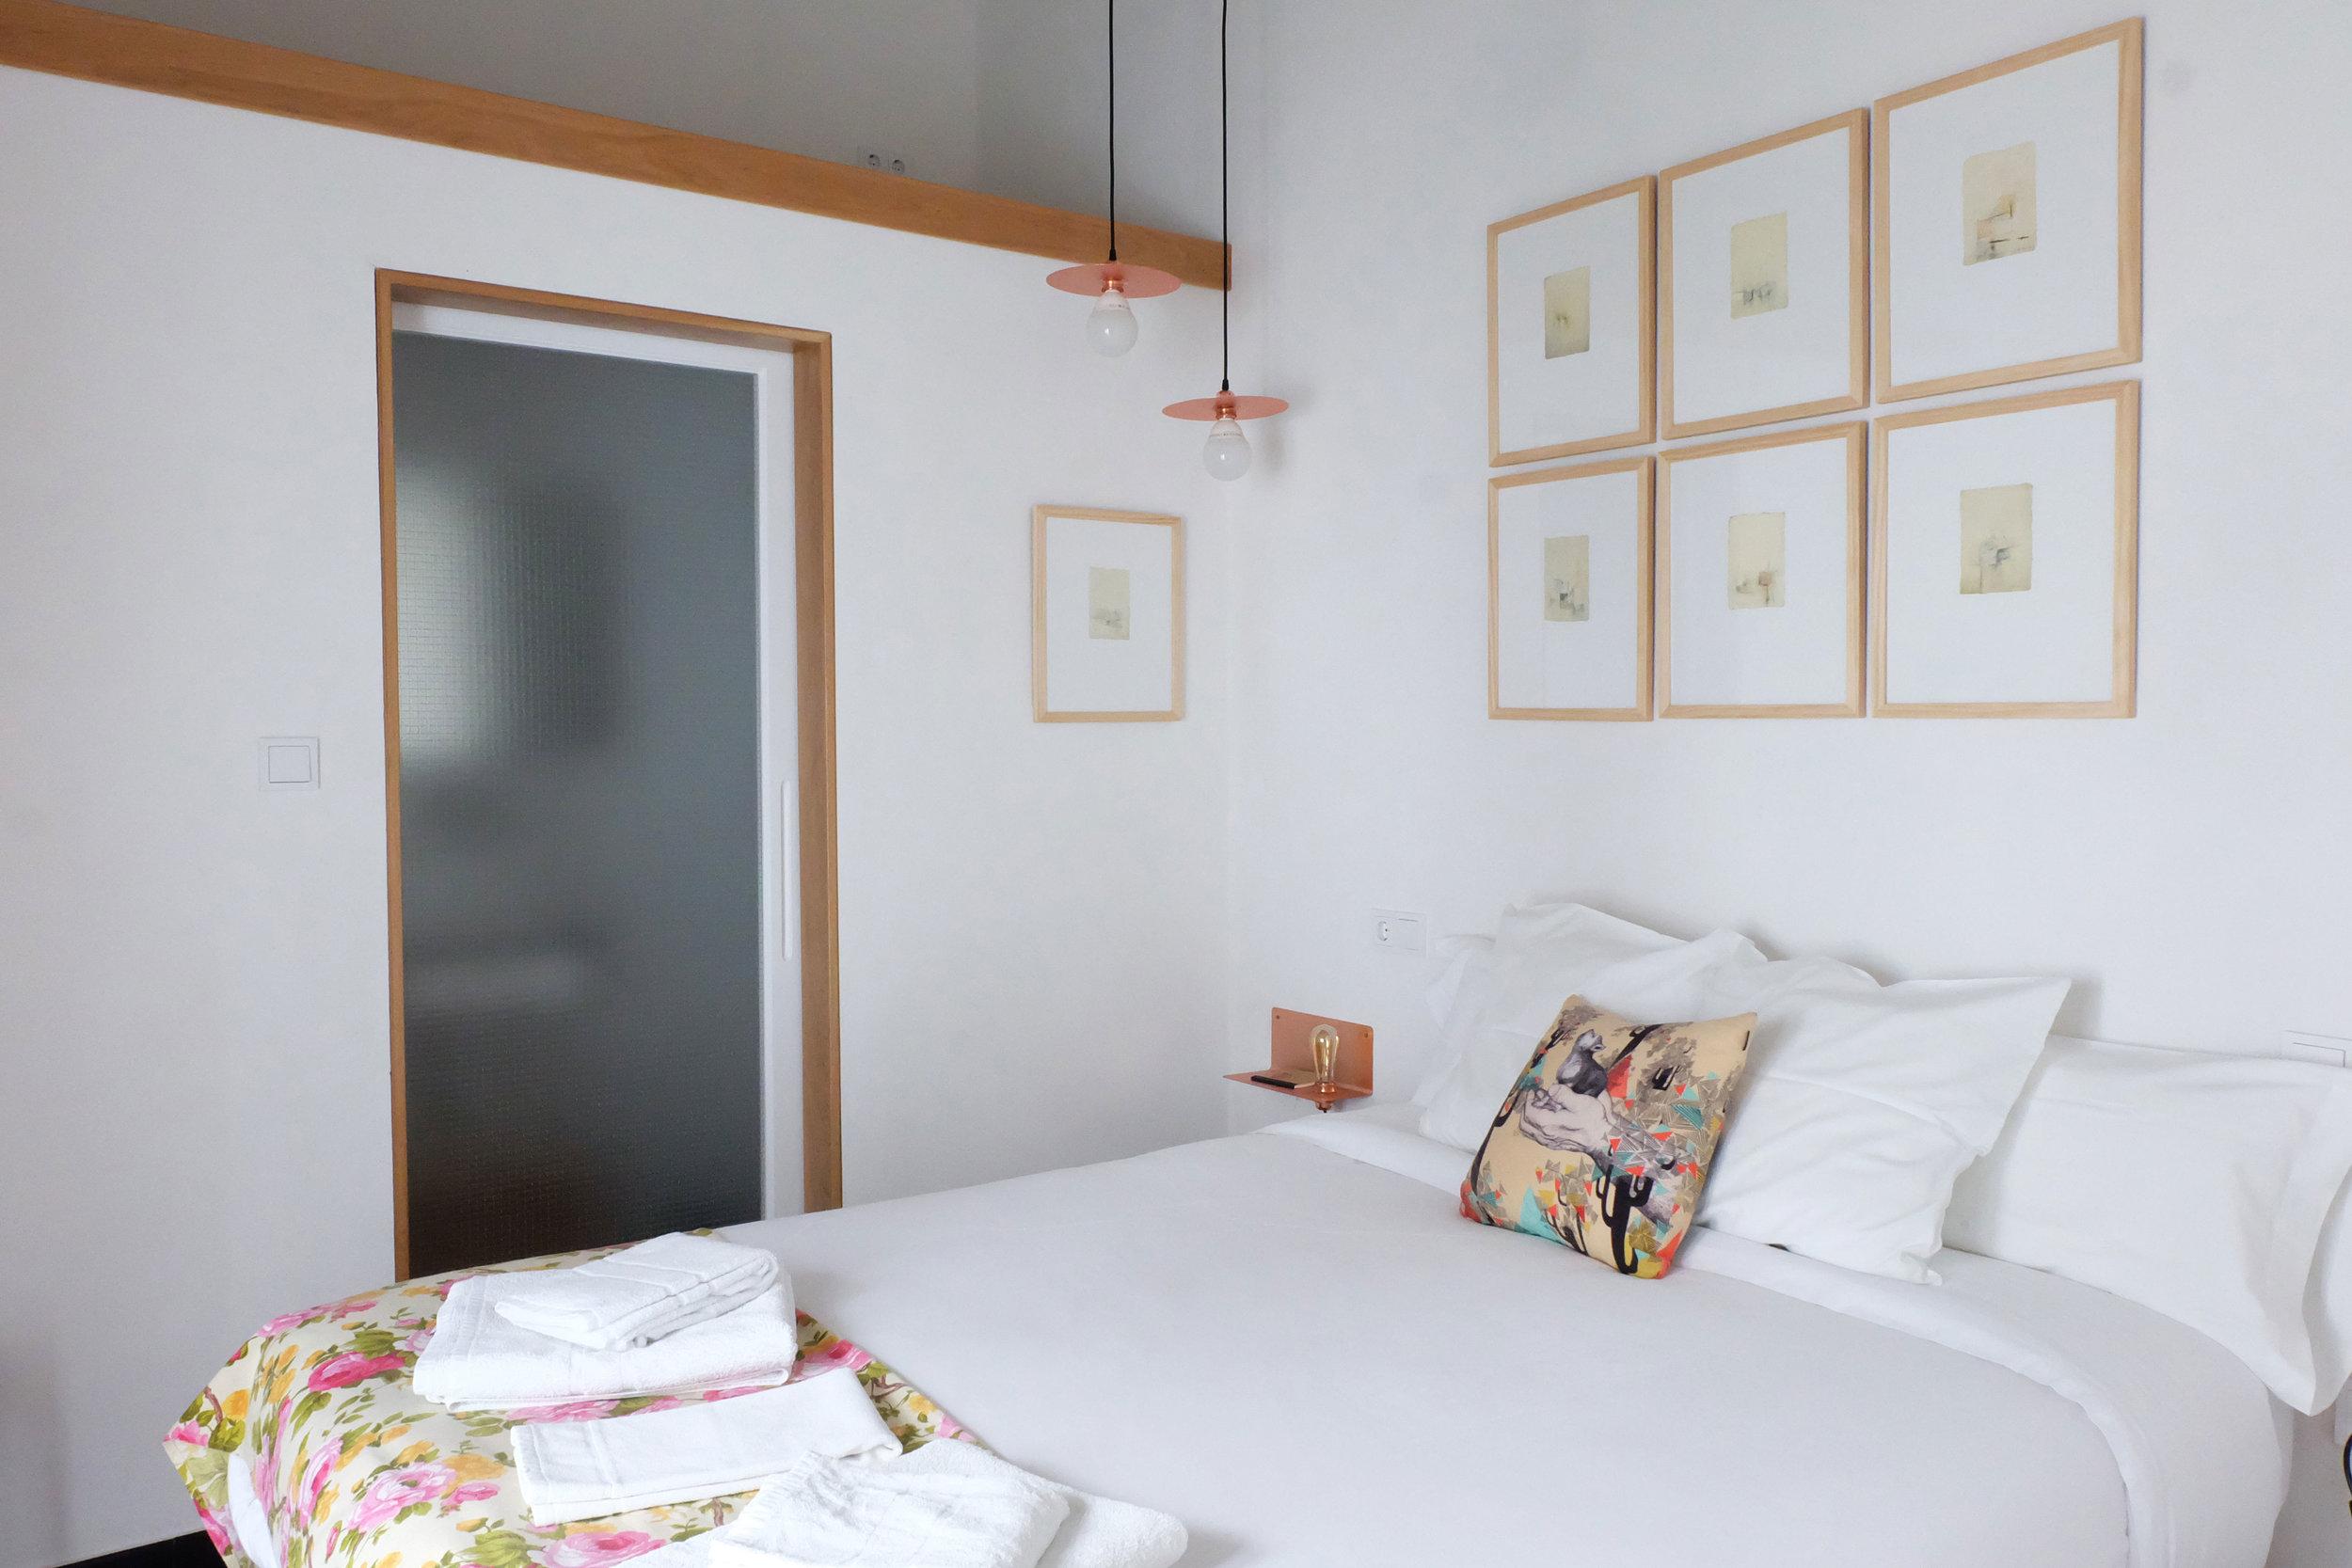 Hotel-Casa-de-Huespedes-Santa-Maria-Habitacion-10-1.jpg